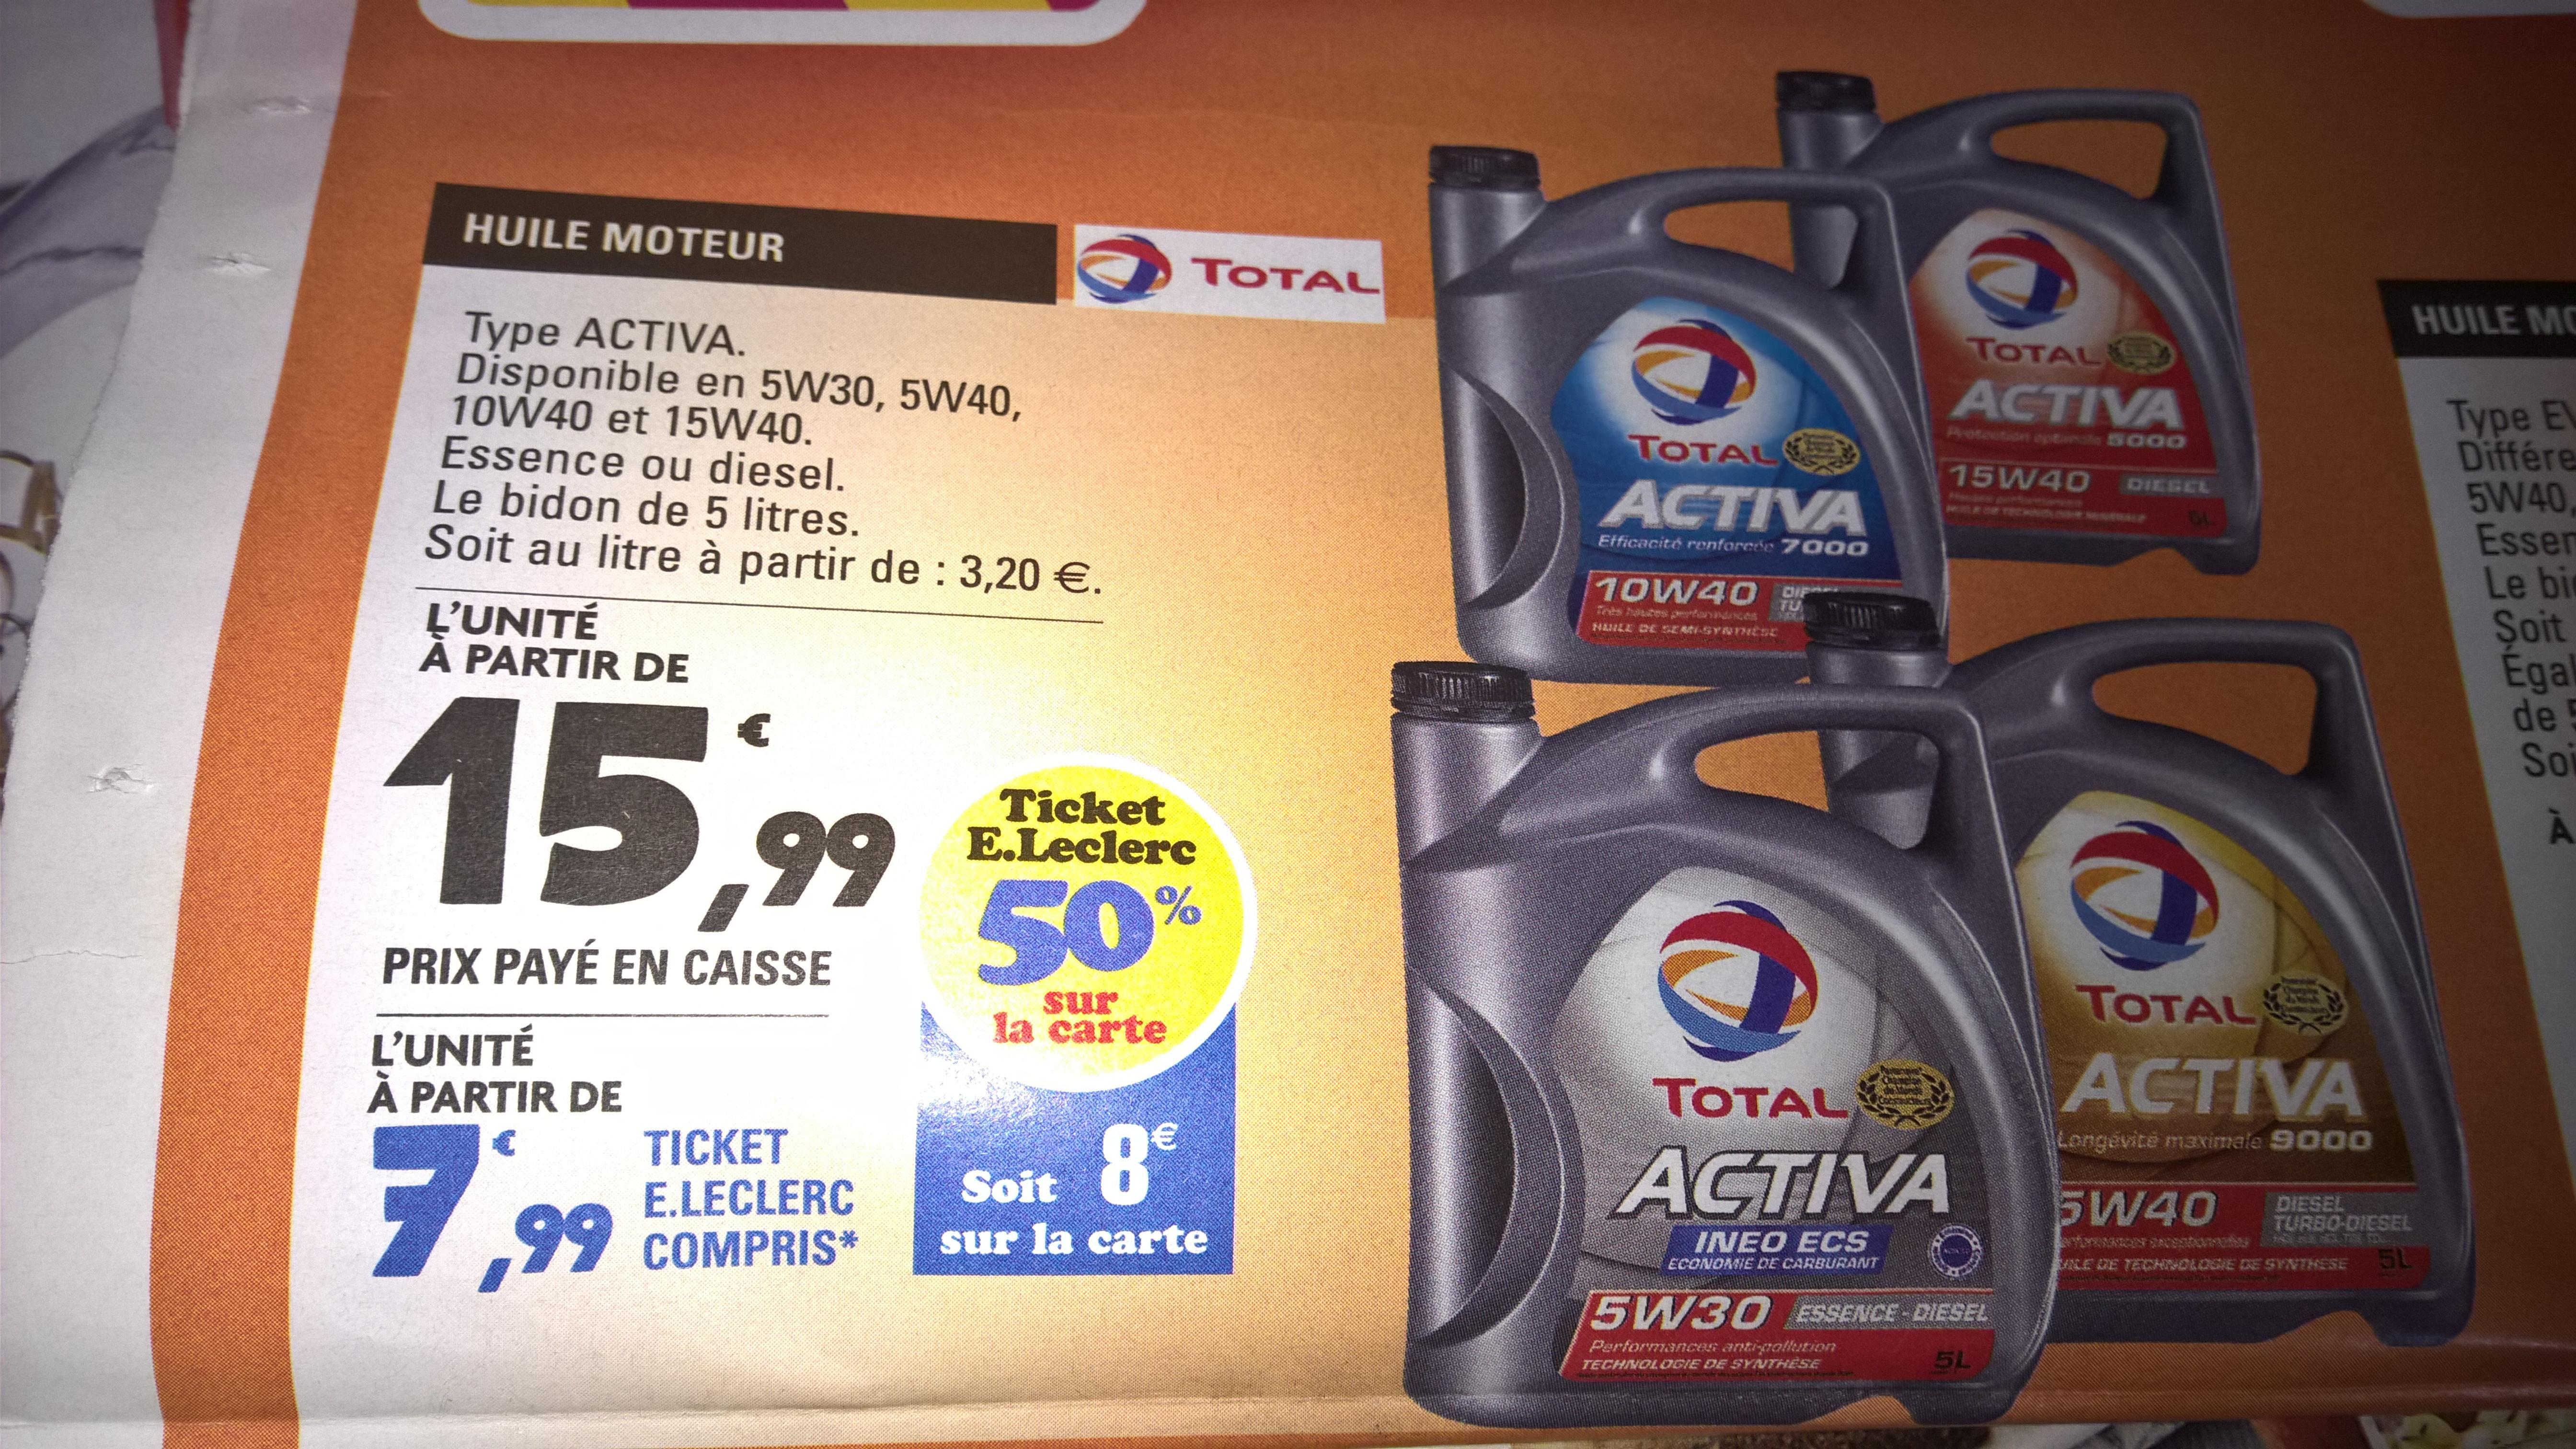 Différentes huiles de moteur Total Activa (5 L) - via 50% en ticket E.Leclerc